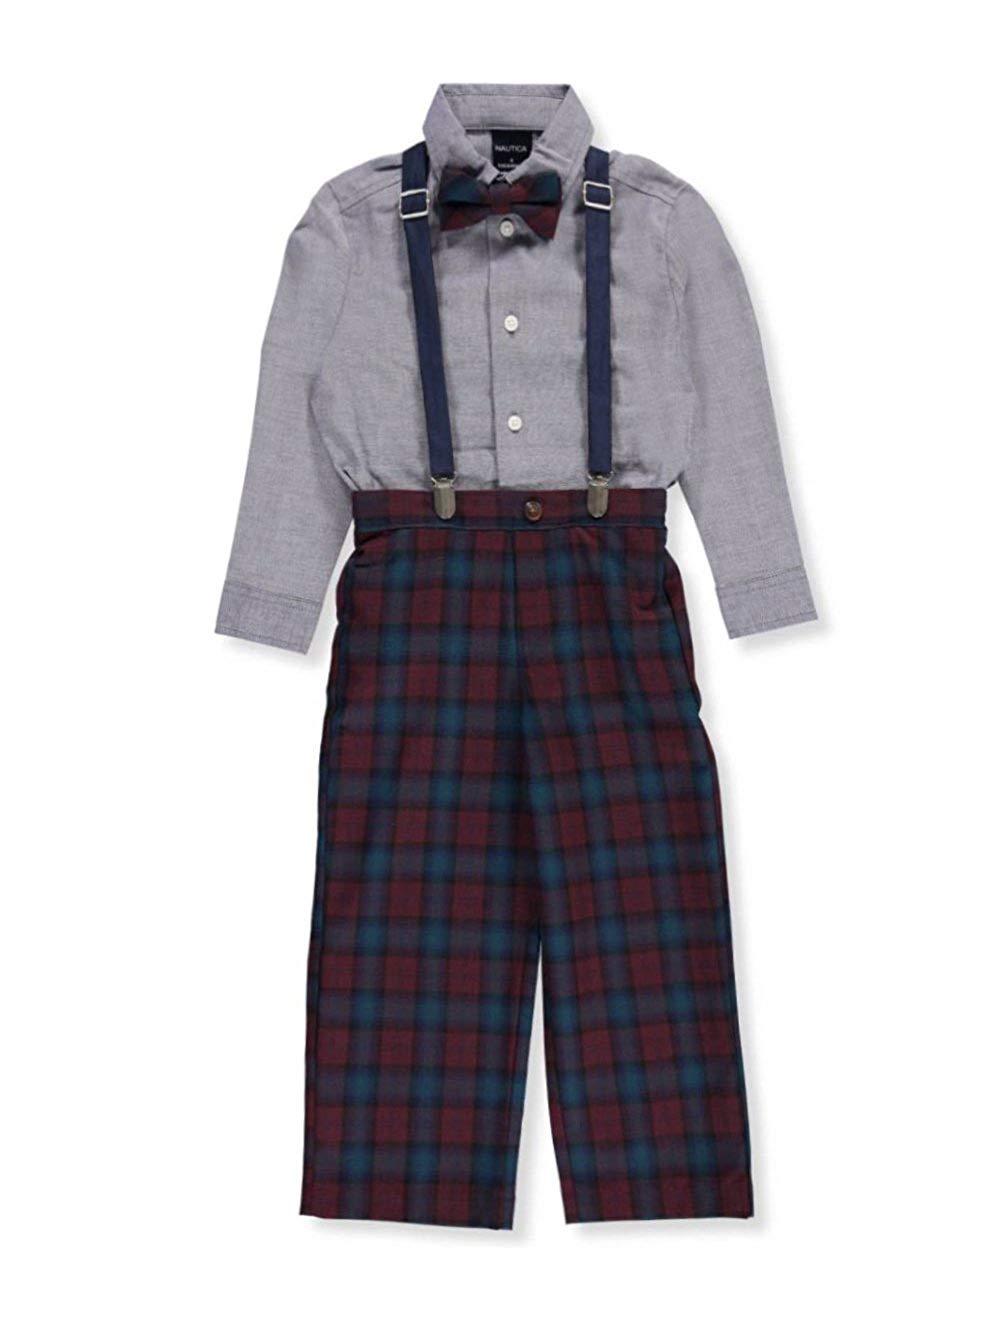 Nautica Little Boys' 4-Piece Outfit